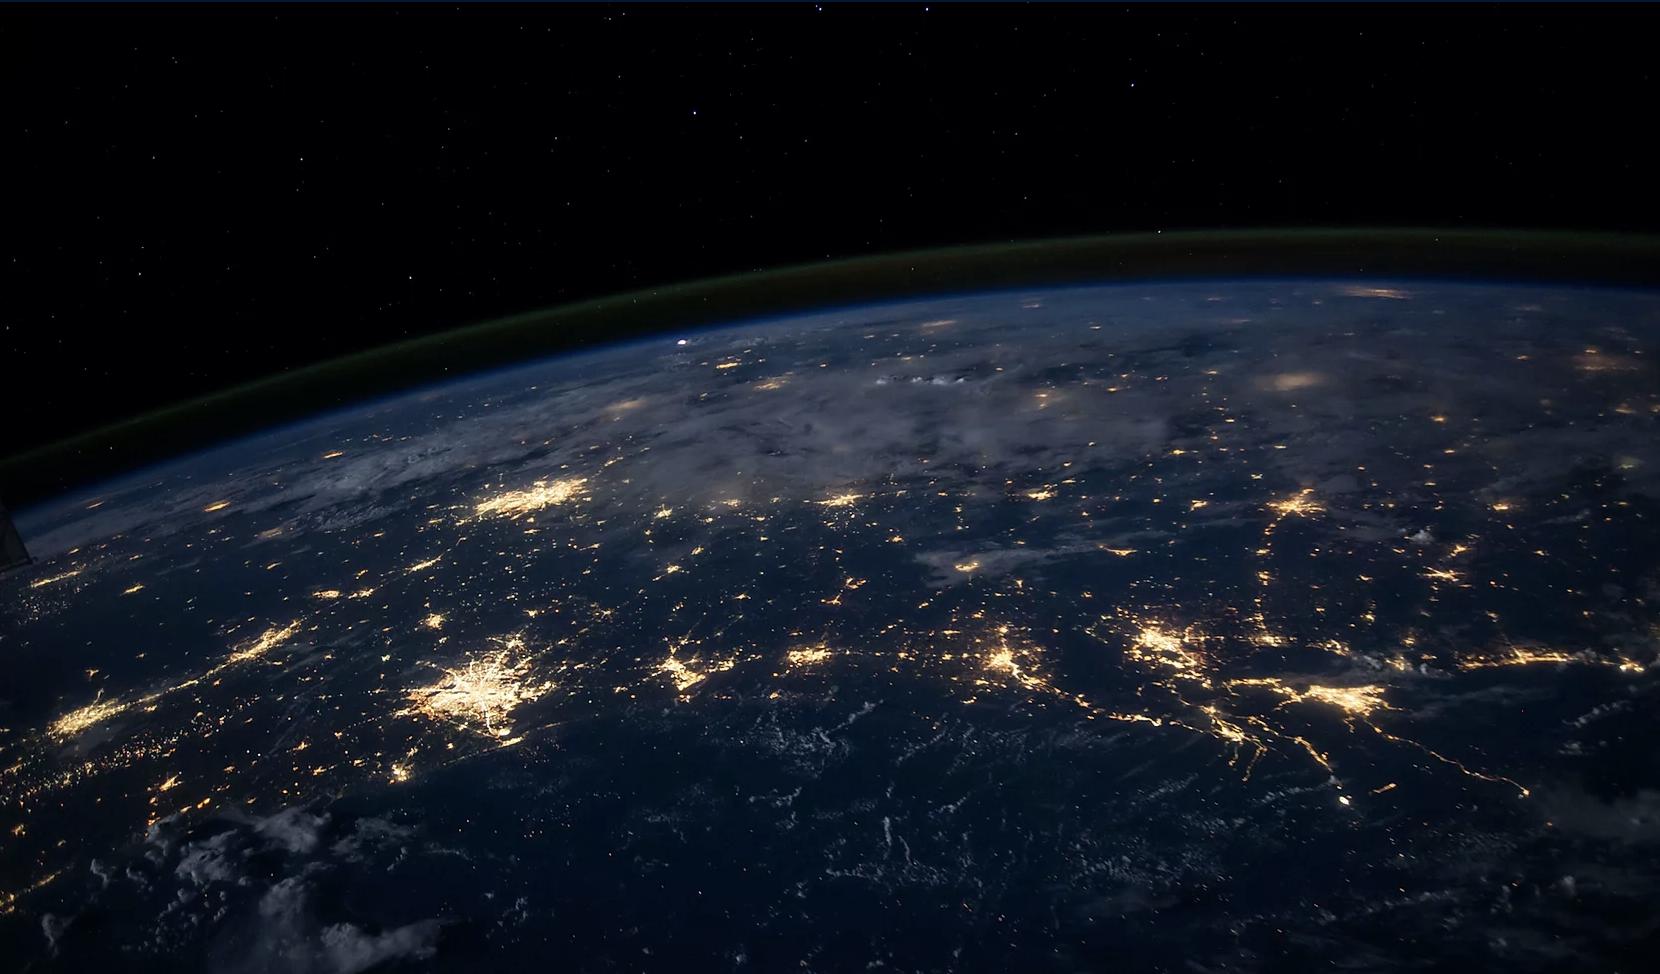 NASA Announces Challenge Seeking Innovative Ideas to Advance Missions